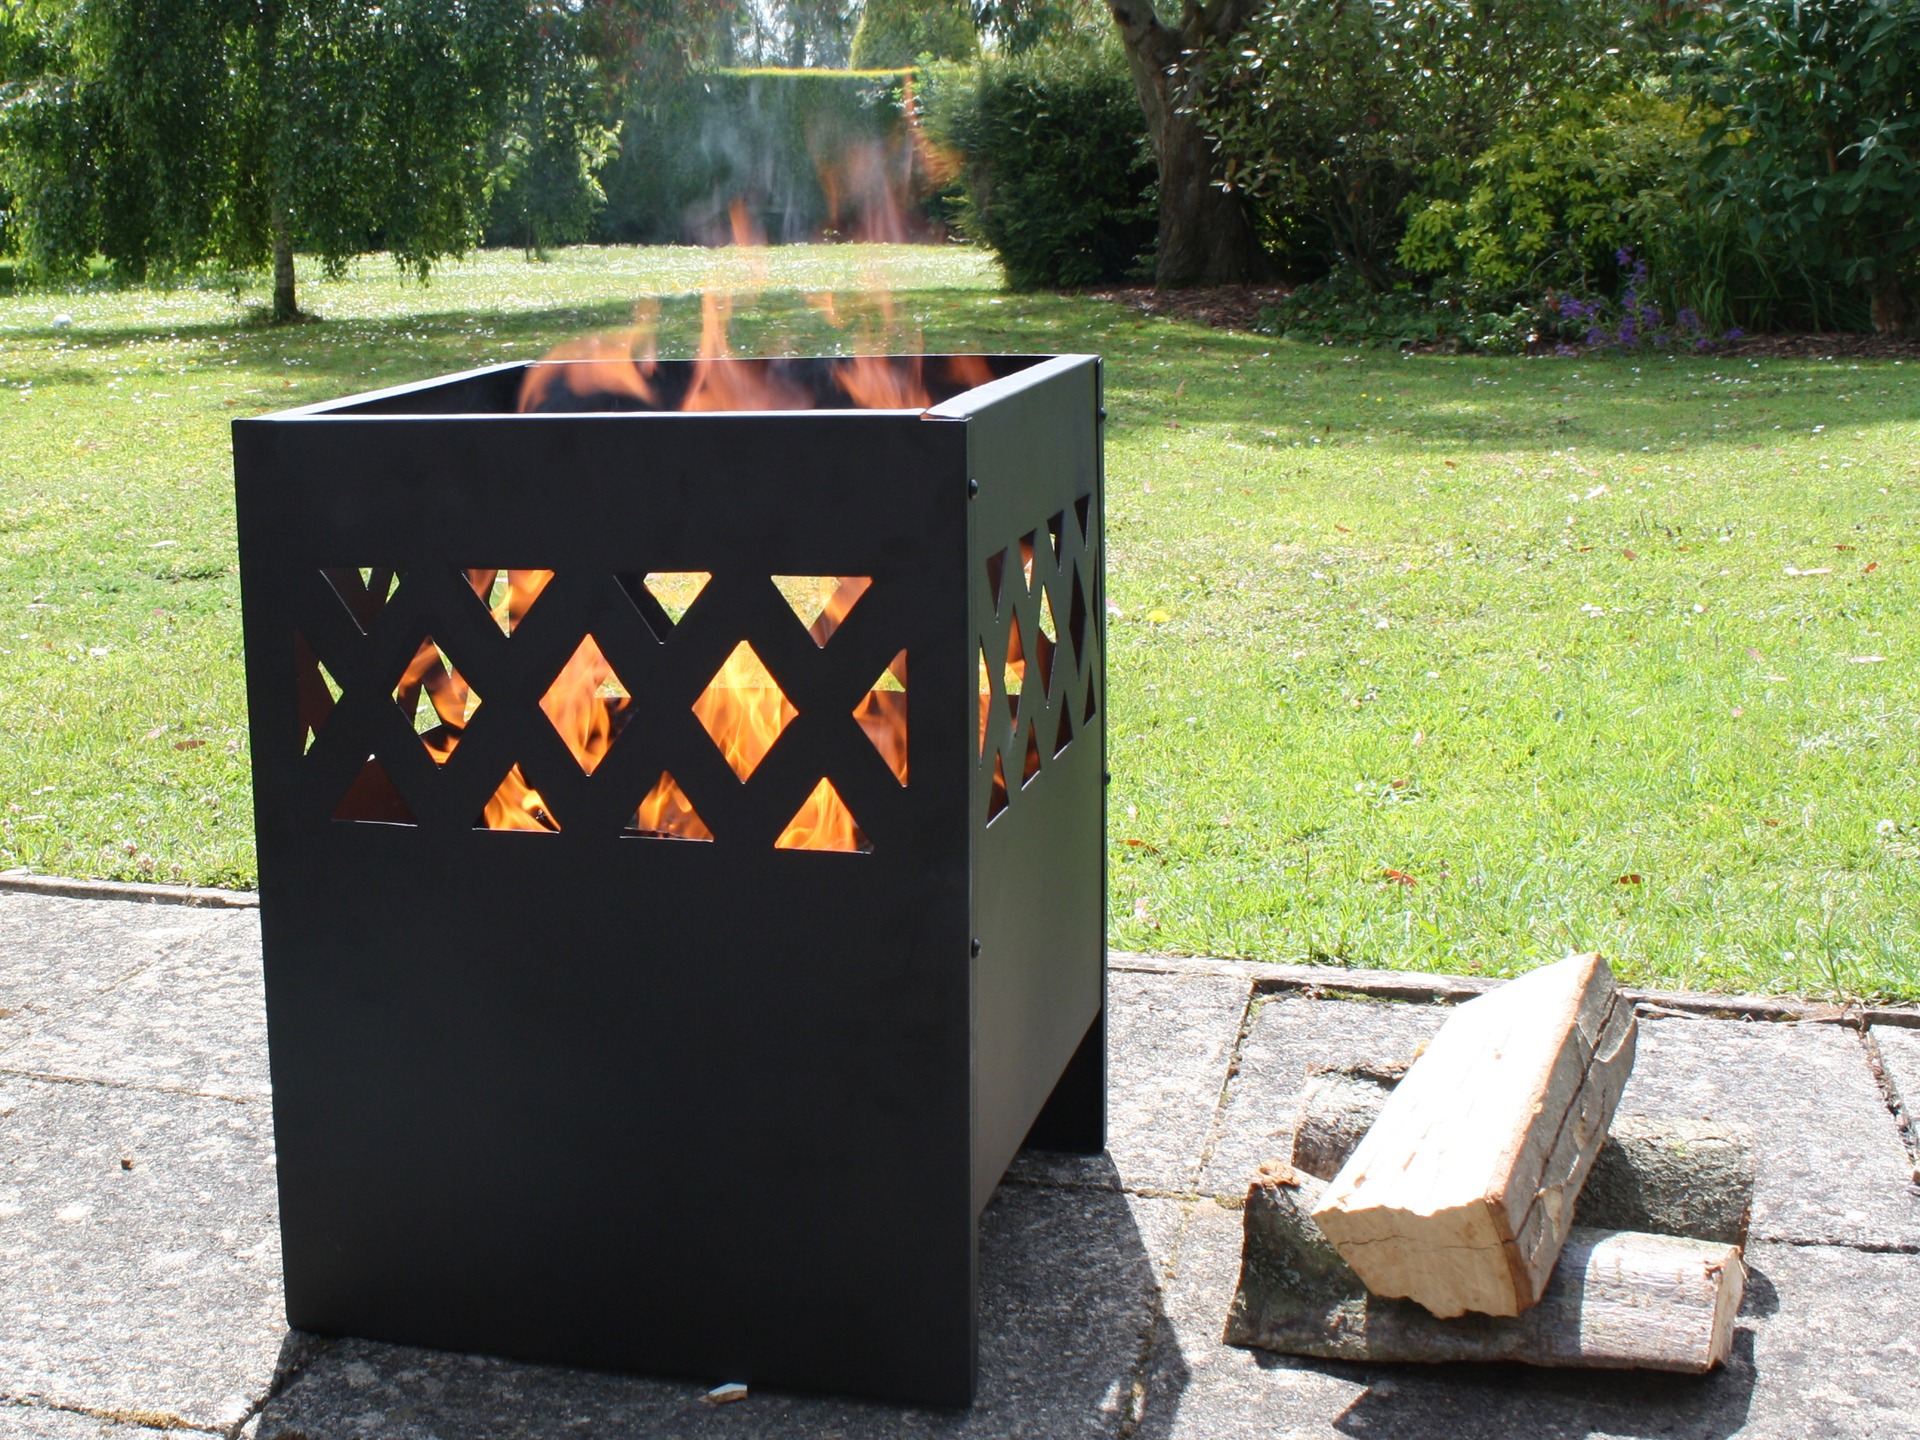 la four pizza en acier inoxydable hauteur 164cm san carlos wood. Black Bedroom Furniture Sets. Home Design Ideas